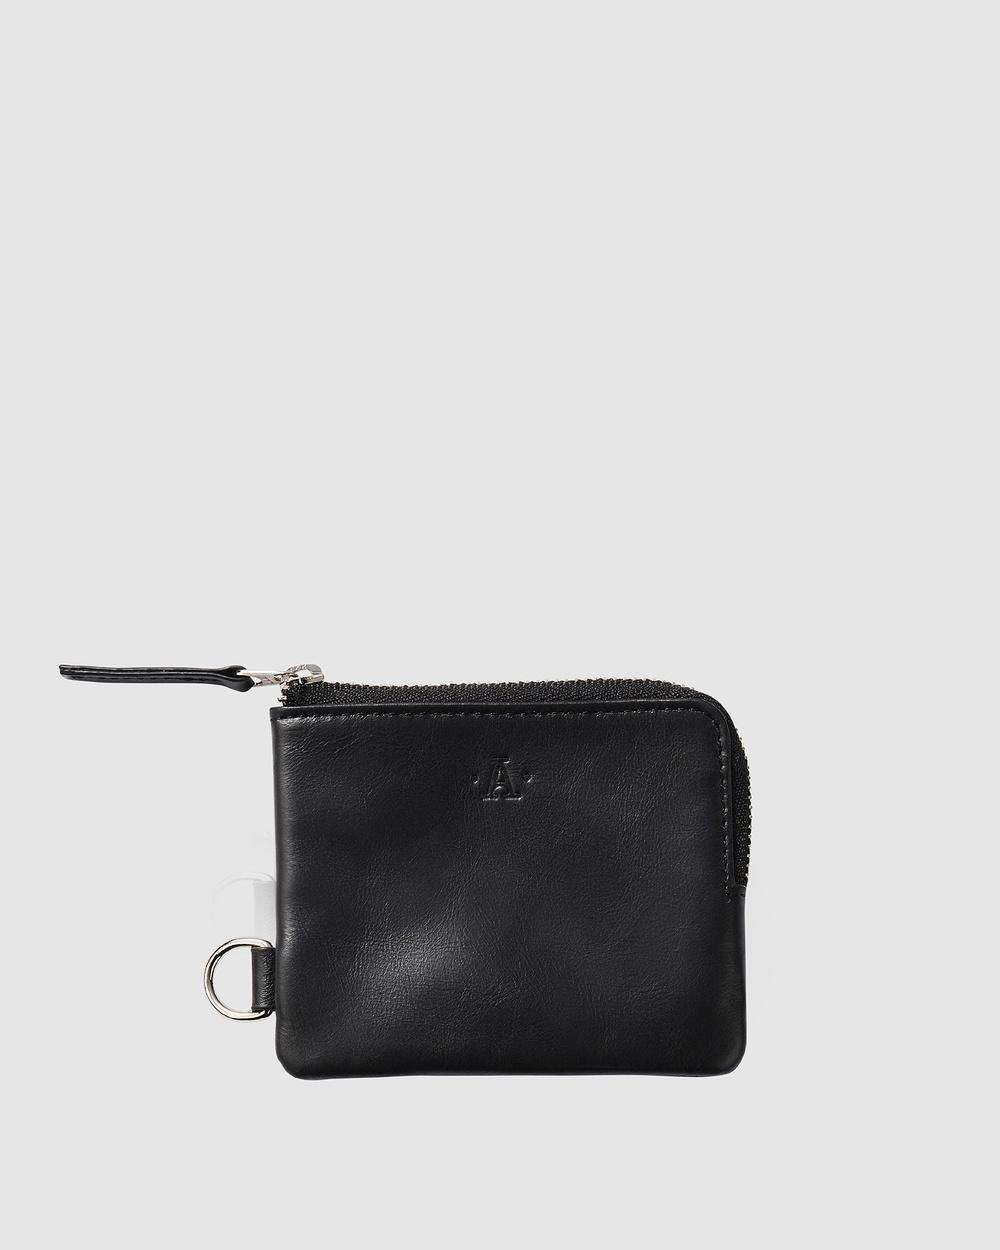 Atlas Lifestyle Co Wallet 01 Wallets Black